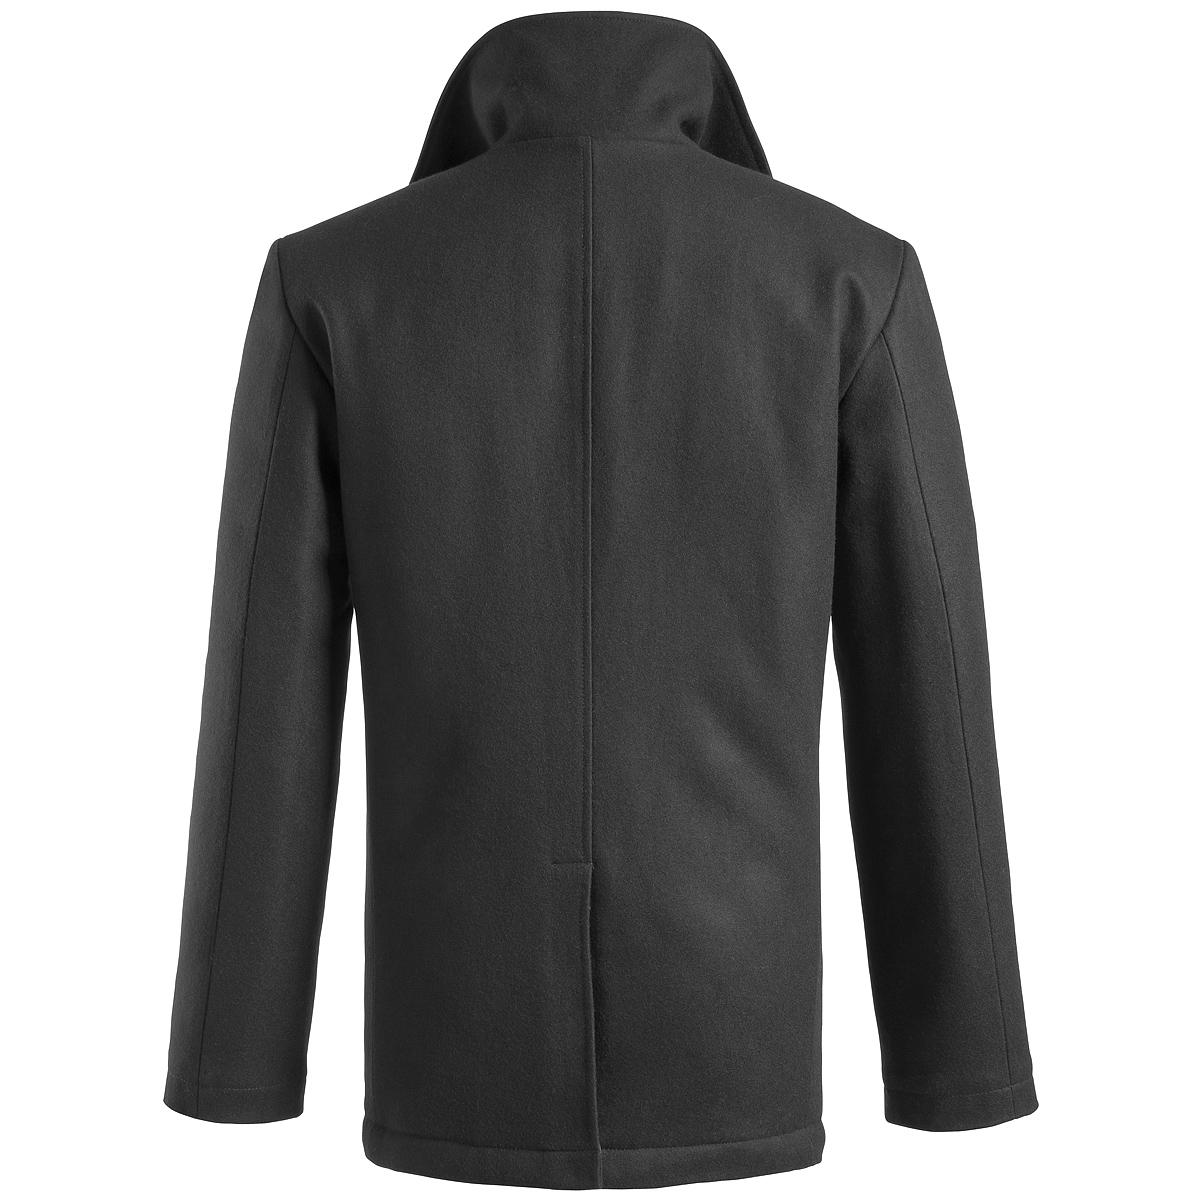 304eec05060 Sentinel Surplus US Navy Pea Coat Classic Style Warm Mens Army Reefer  Jacket Wool Black